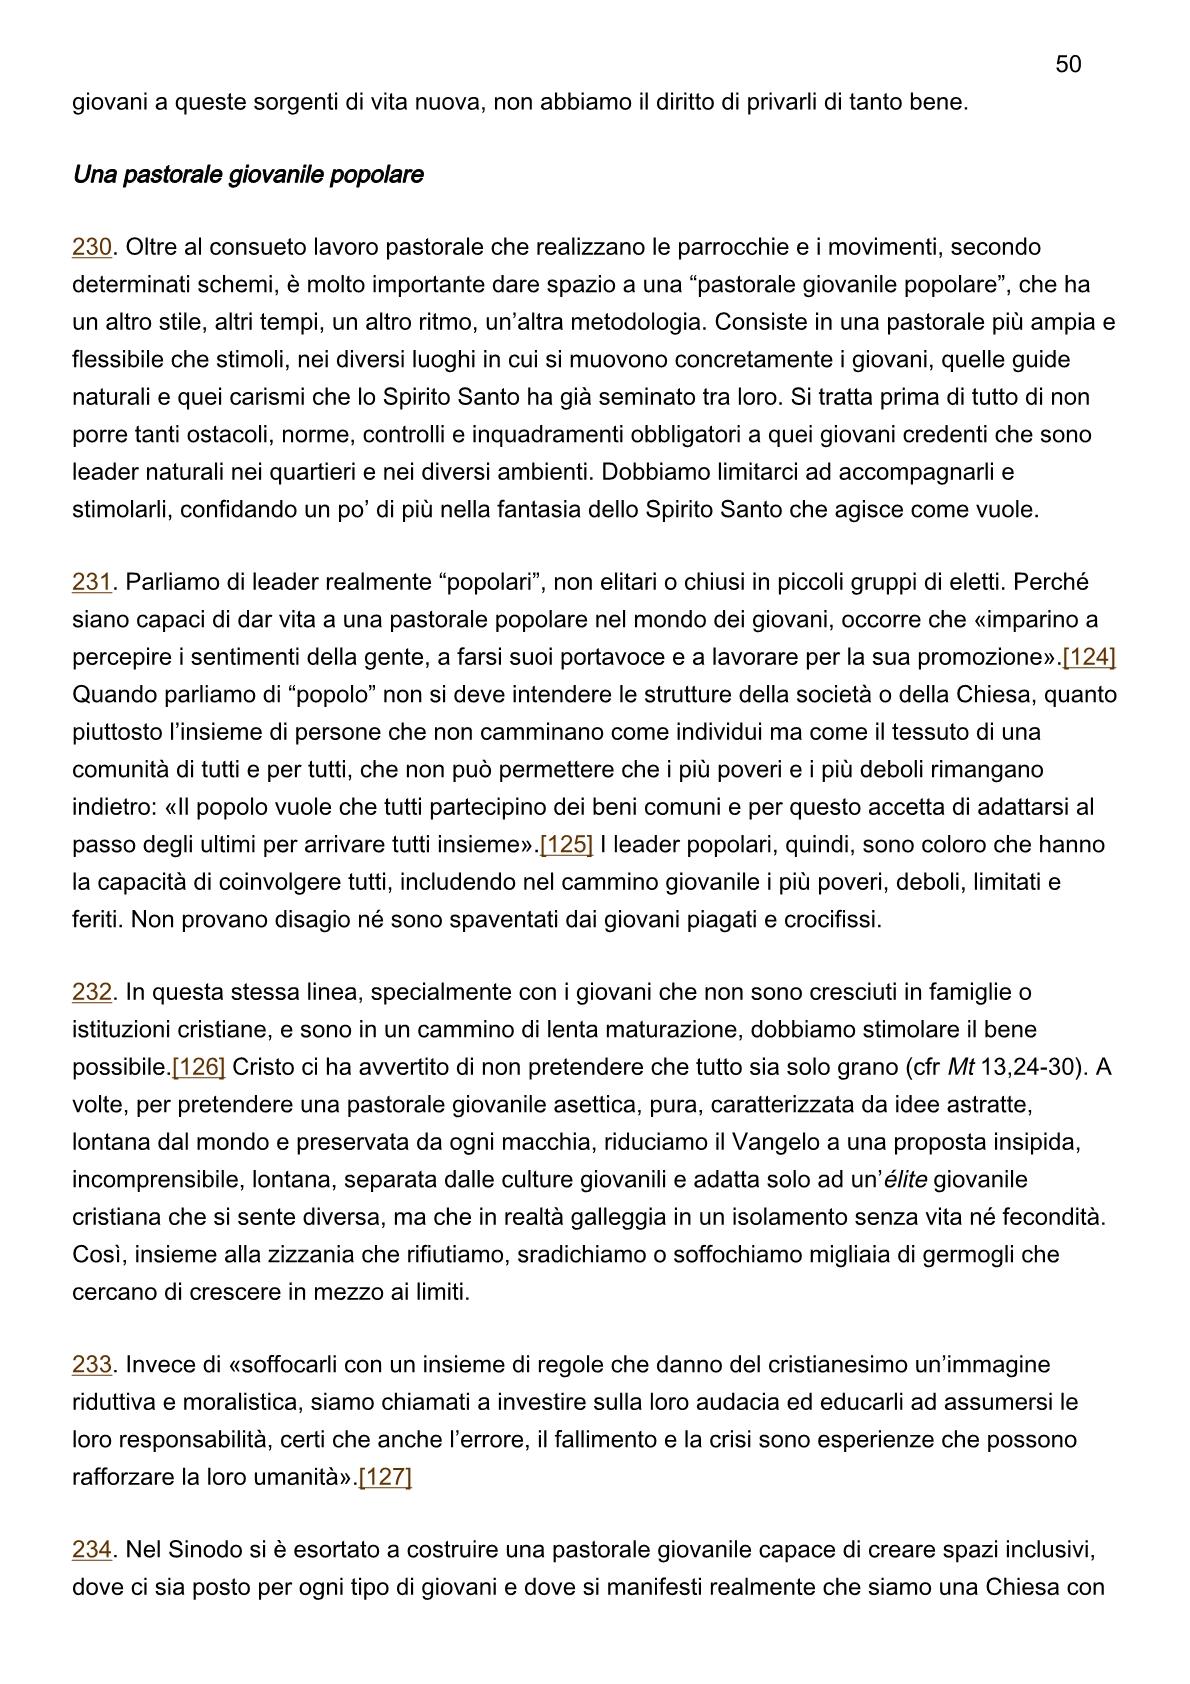 papa-francesco_esortazione-ap_20190325_christus-vivit50